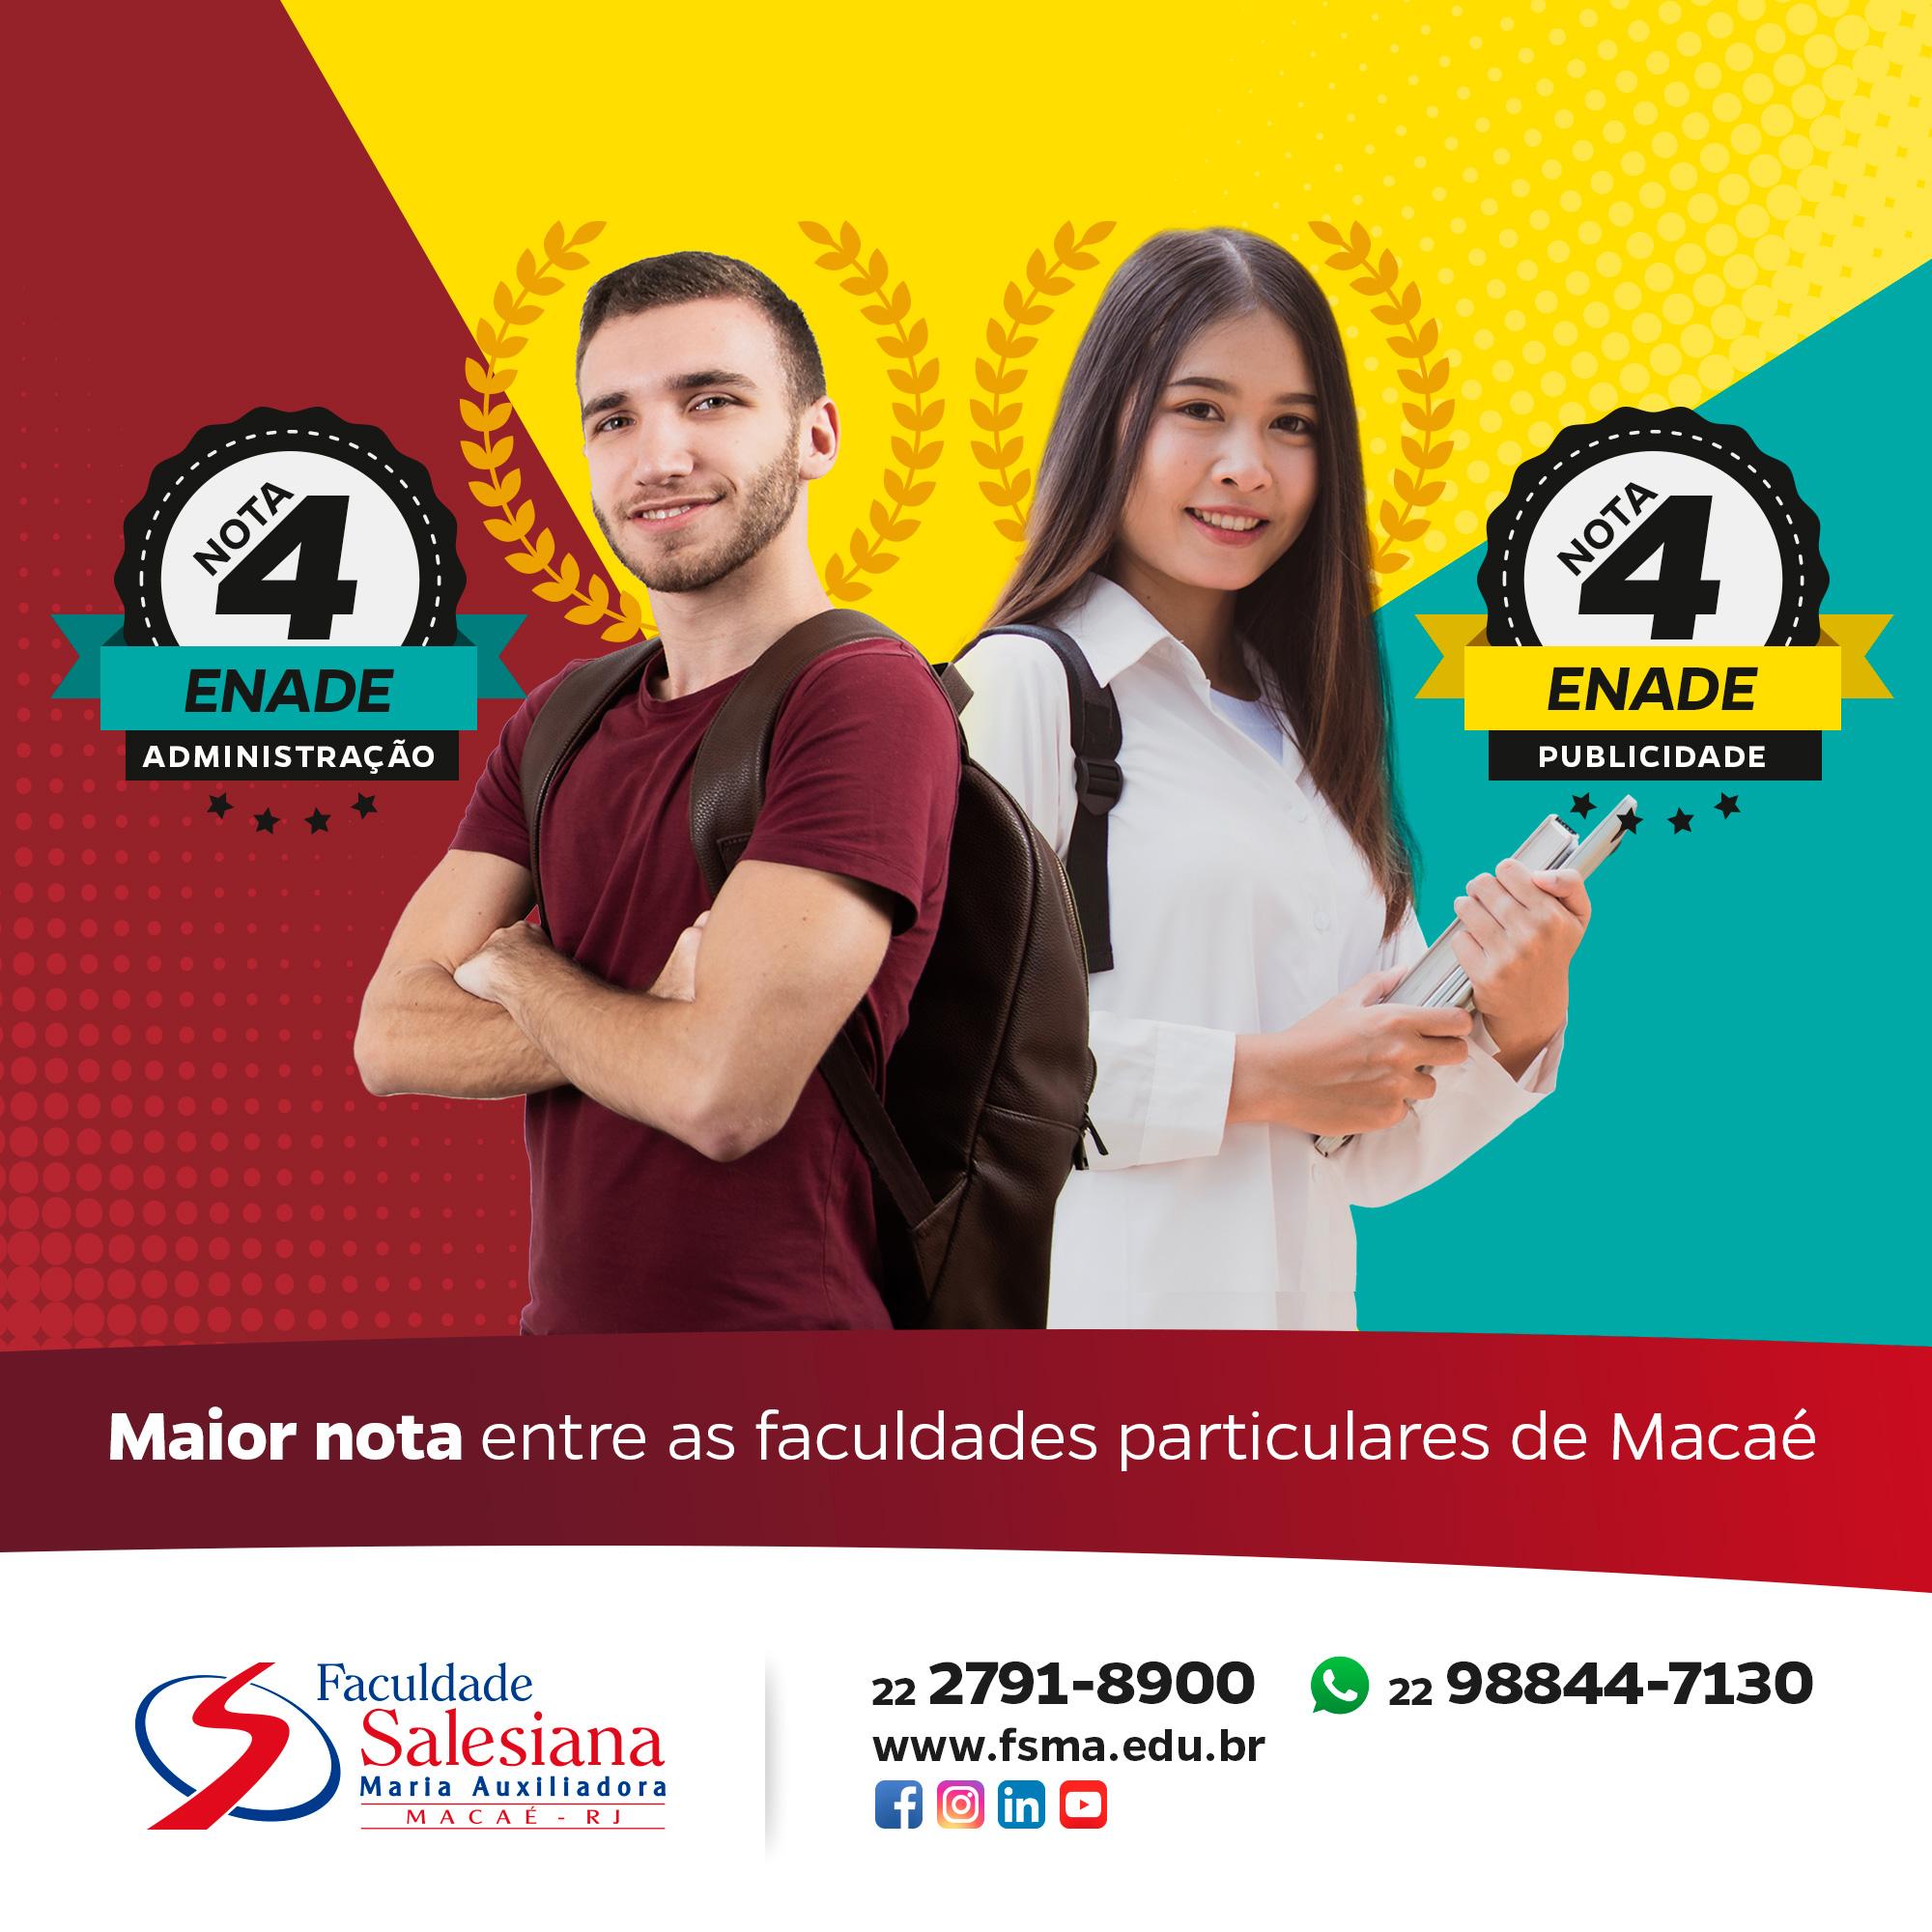 Salesiana Macaé obteve a maior nota entre as faculdades particulares no Enade